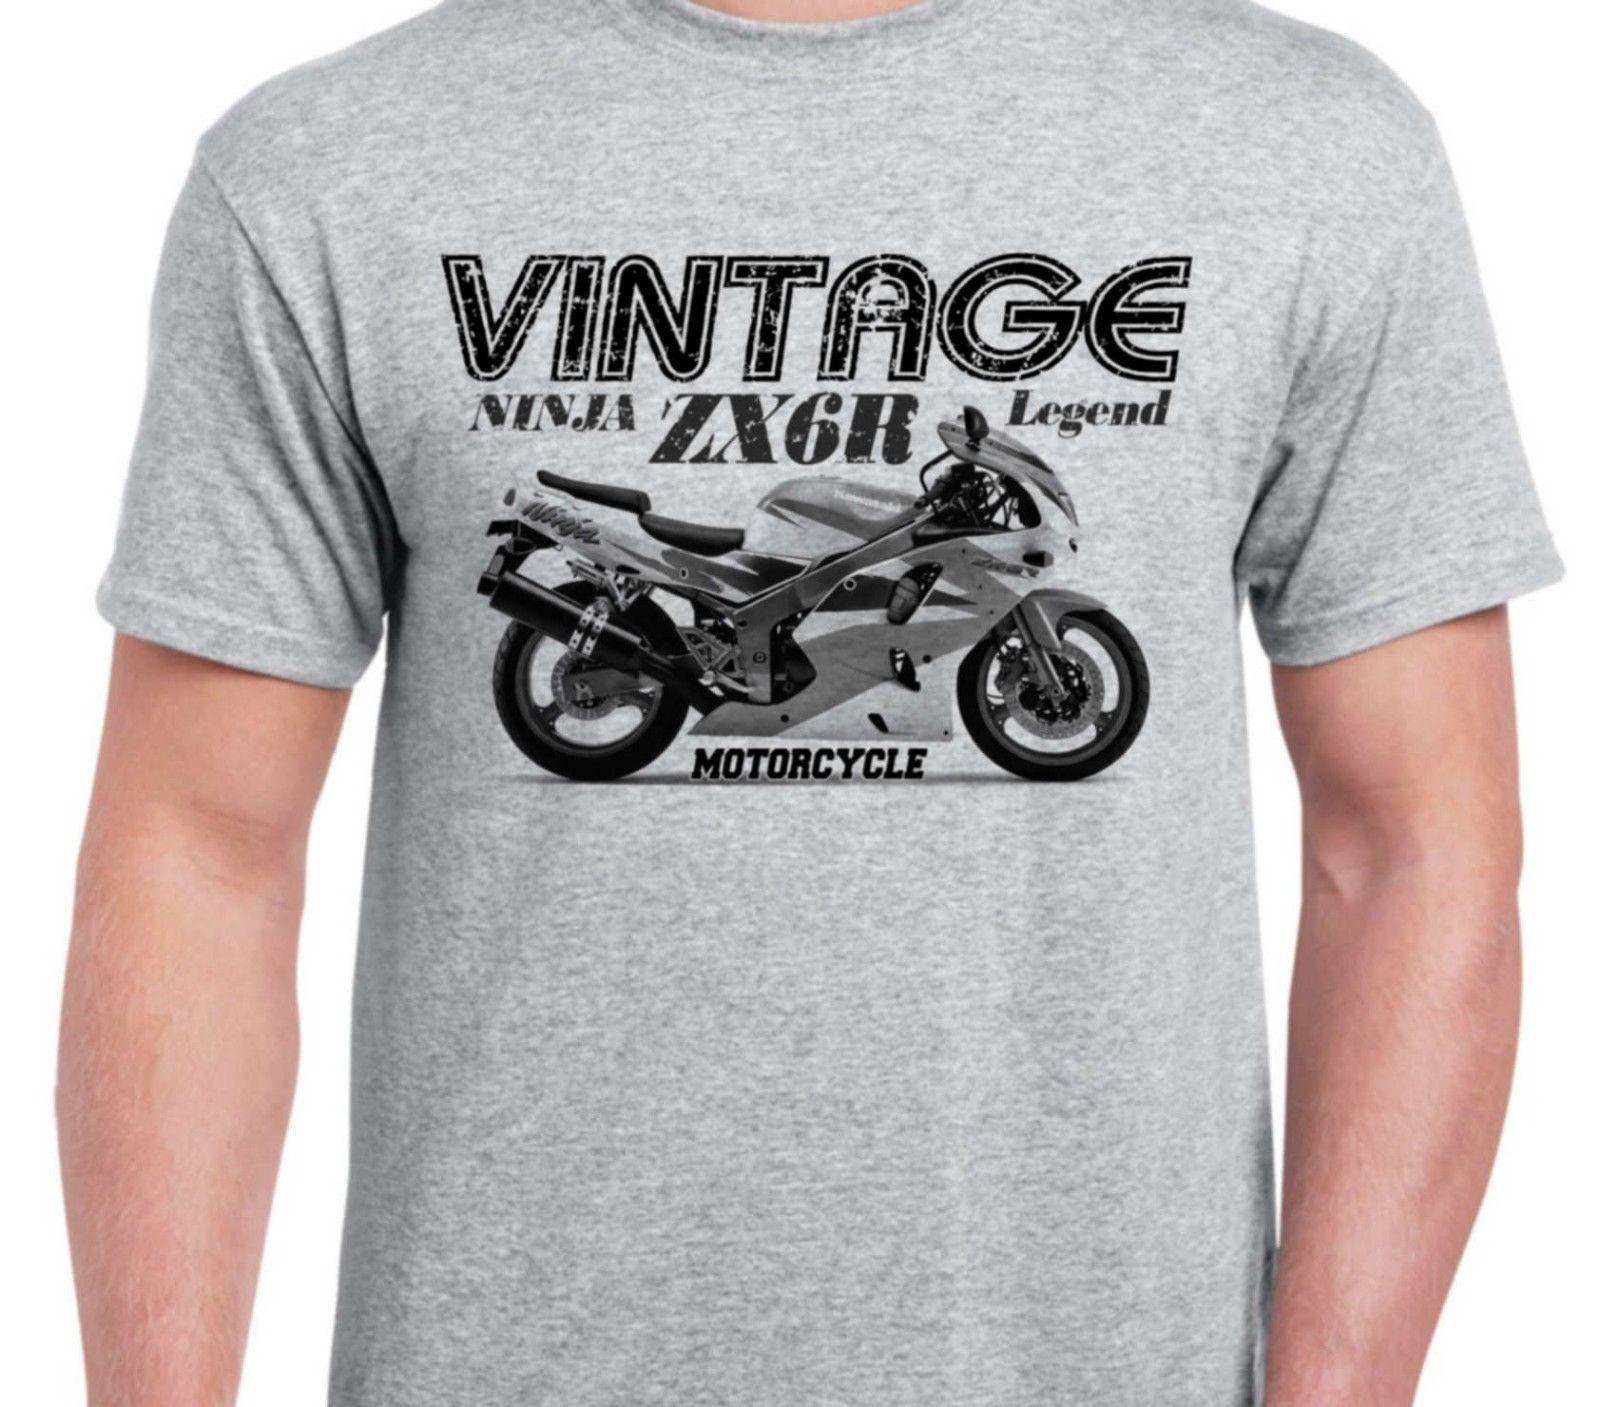 Kawasaki Ninja Zx6r 95 Inspired Vintage Classic Motorcycle Bike